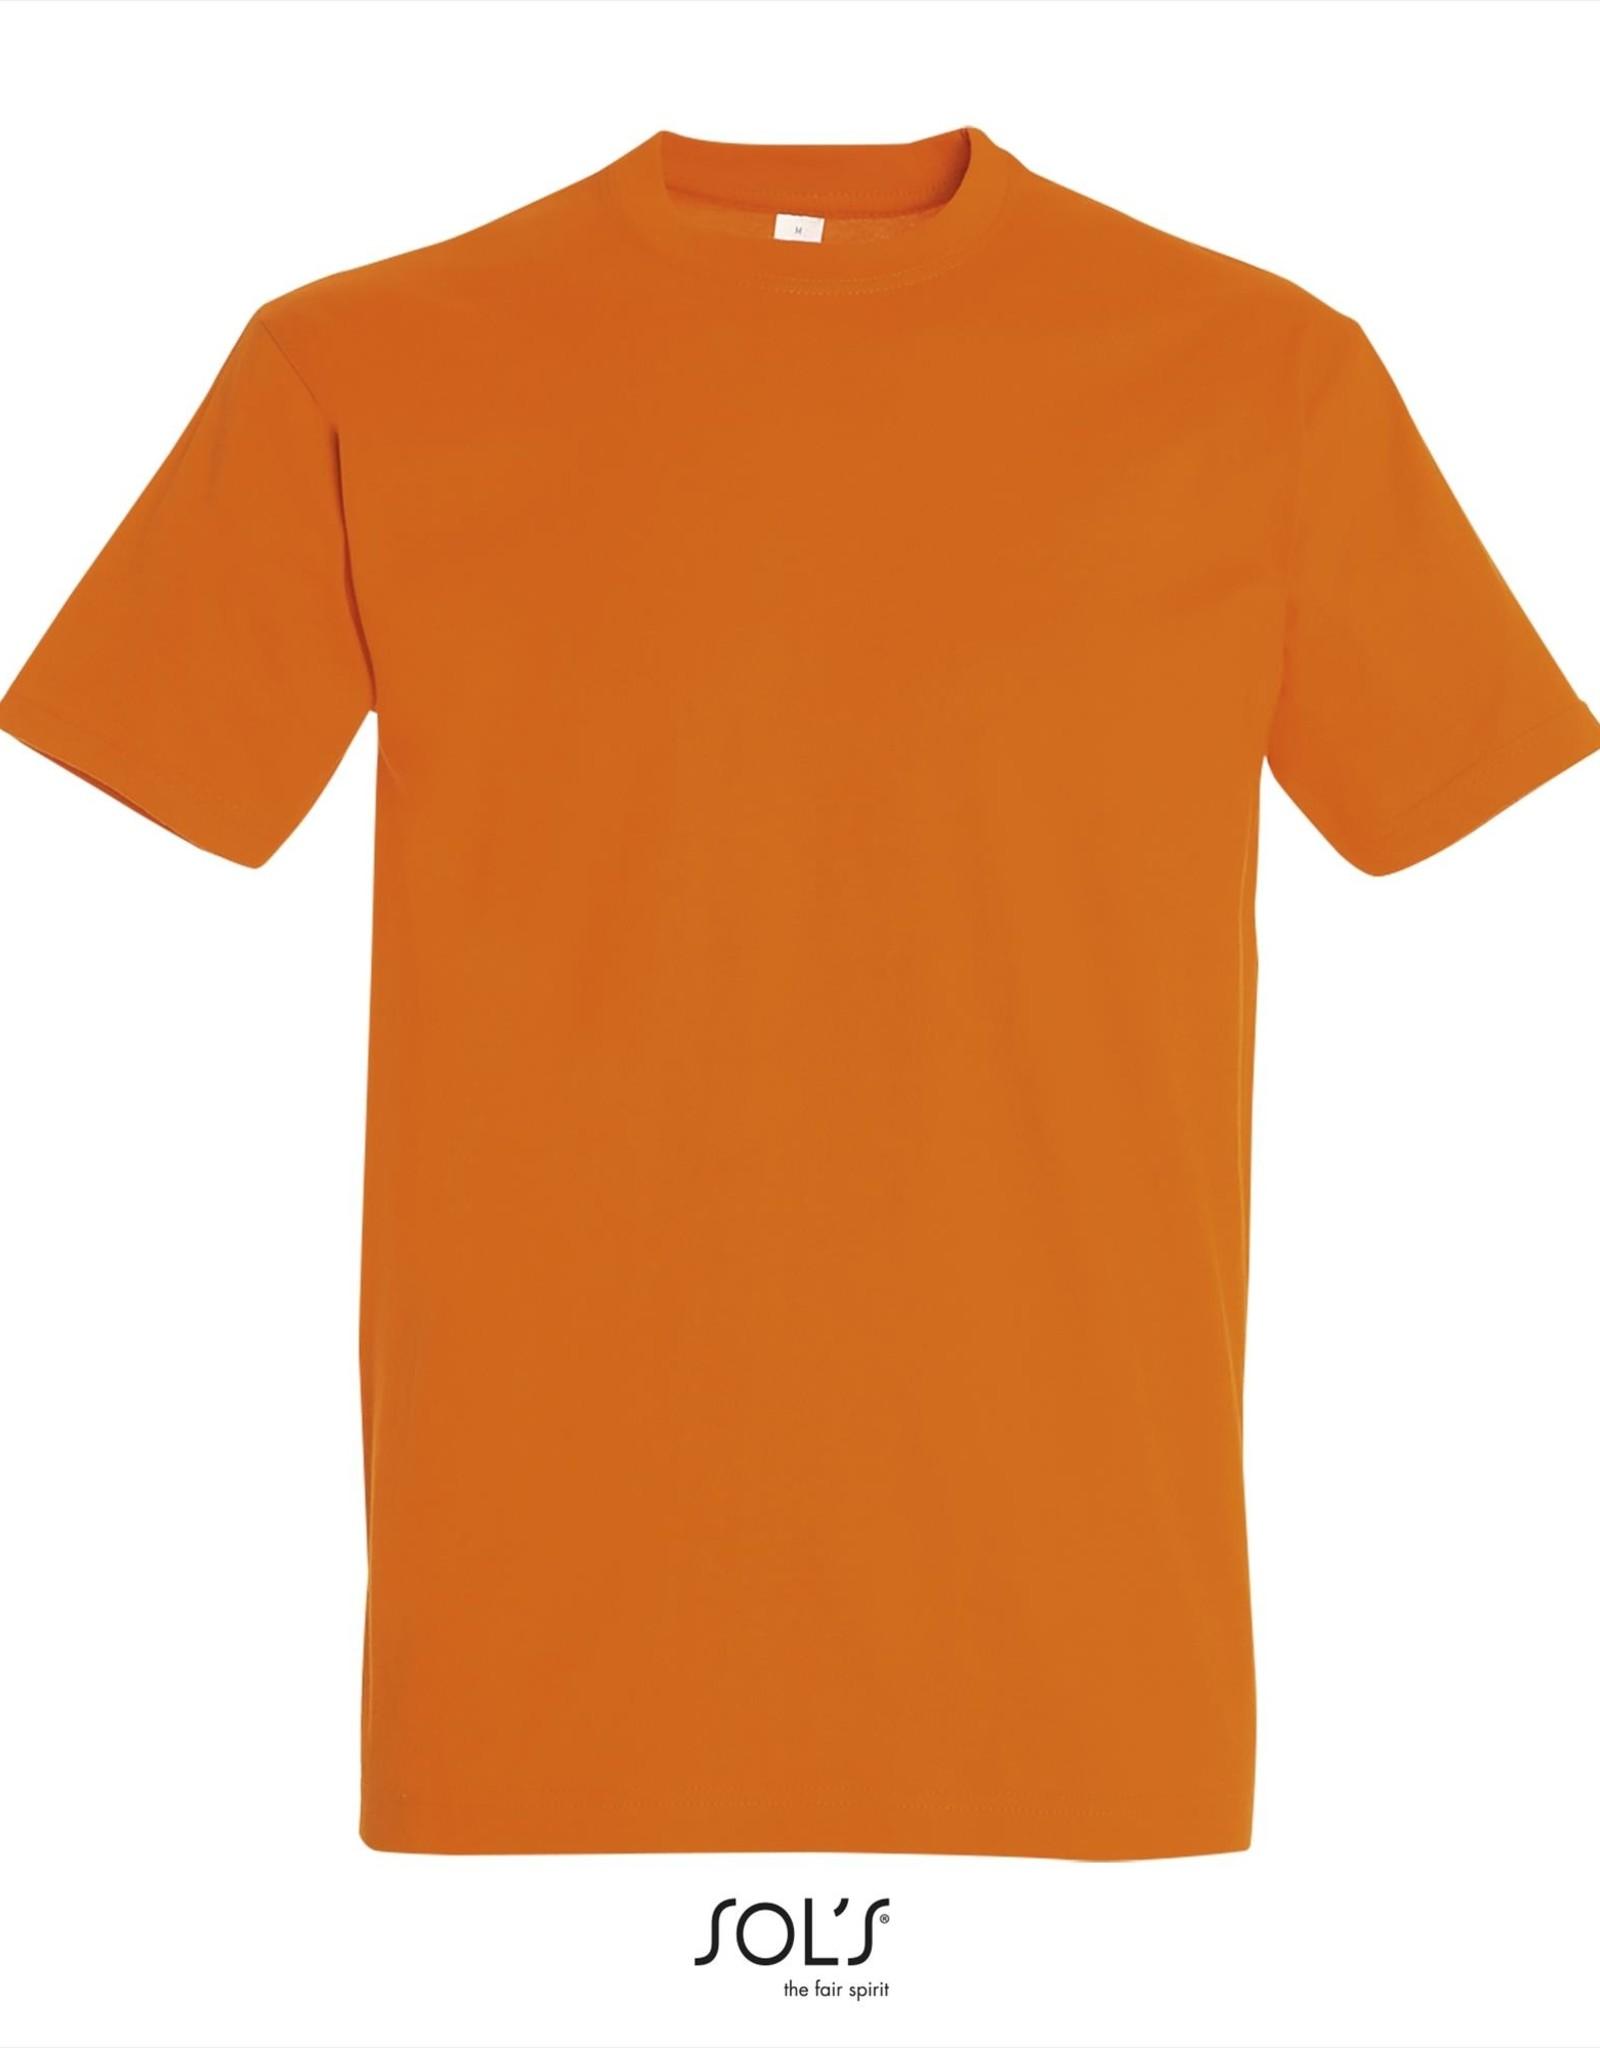 Sol's T-SHIRT basic ronde hals gekleurd 'Imperial' oranje